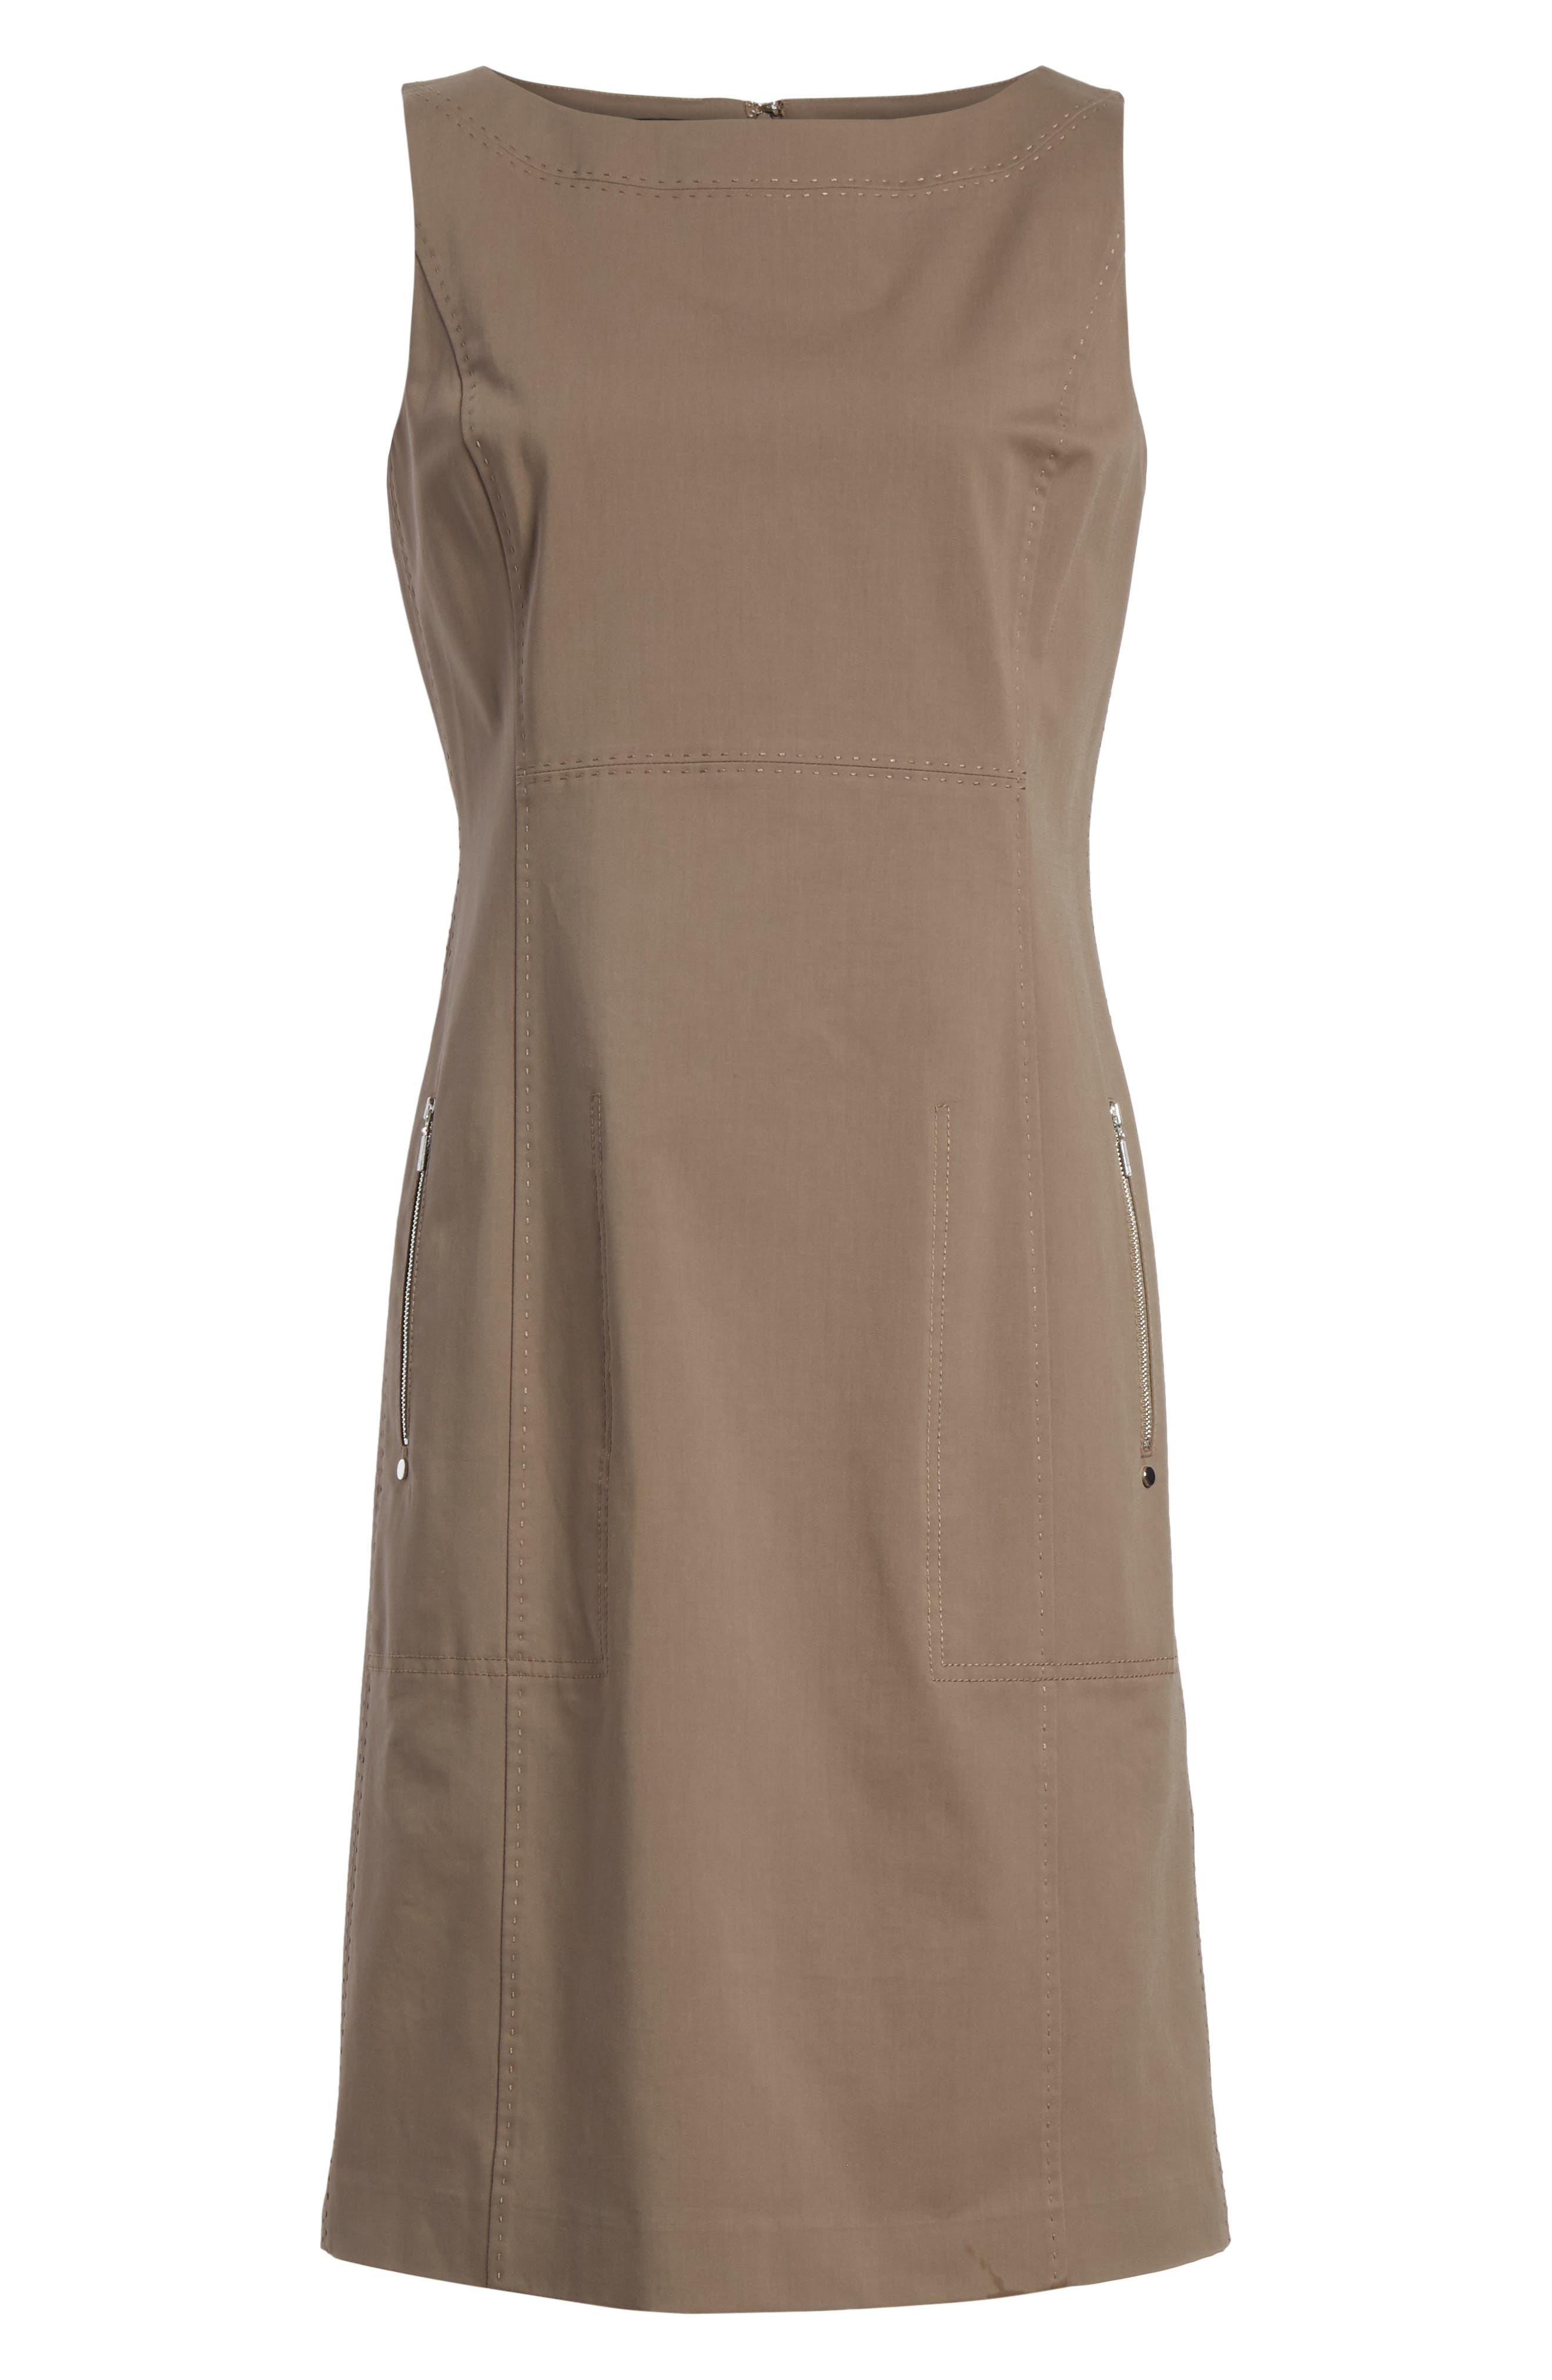 Paxton Sleeveless Sheath Dress,                             Alternate thumbnail 7, color,                             Nougat